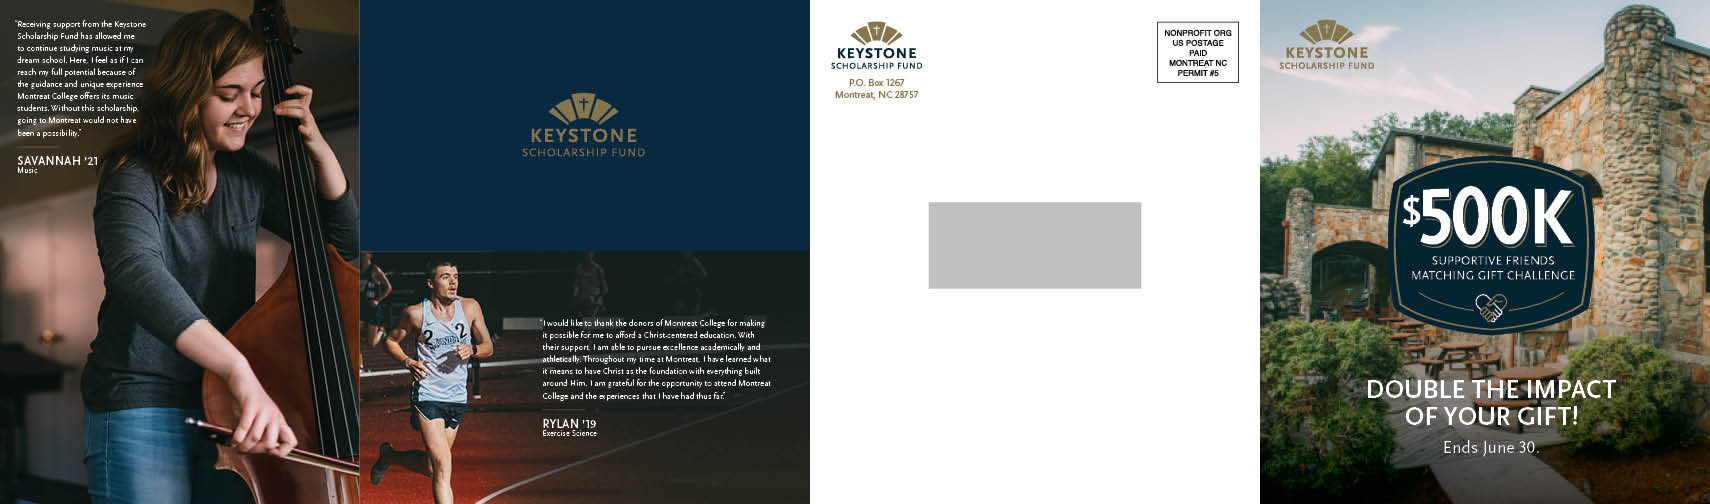 Keystone_Brochure_P_v132.jpg